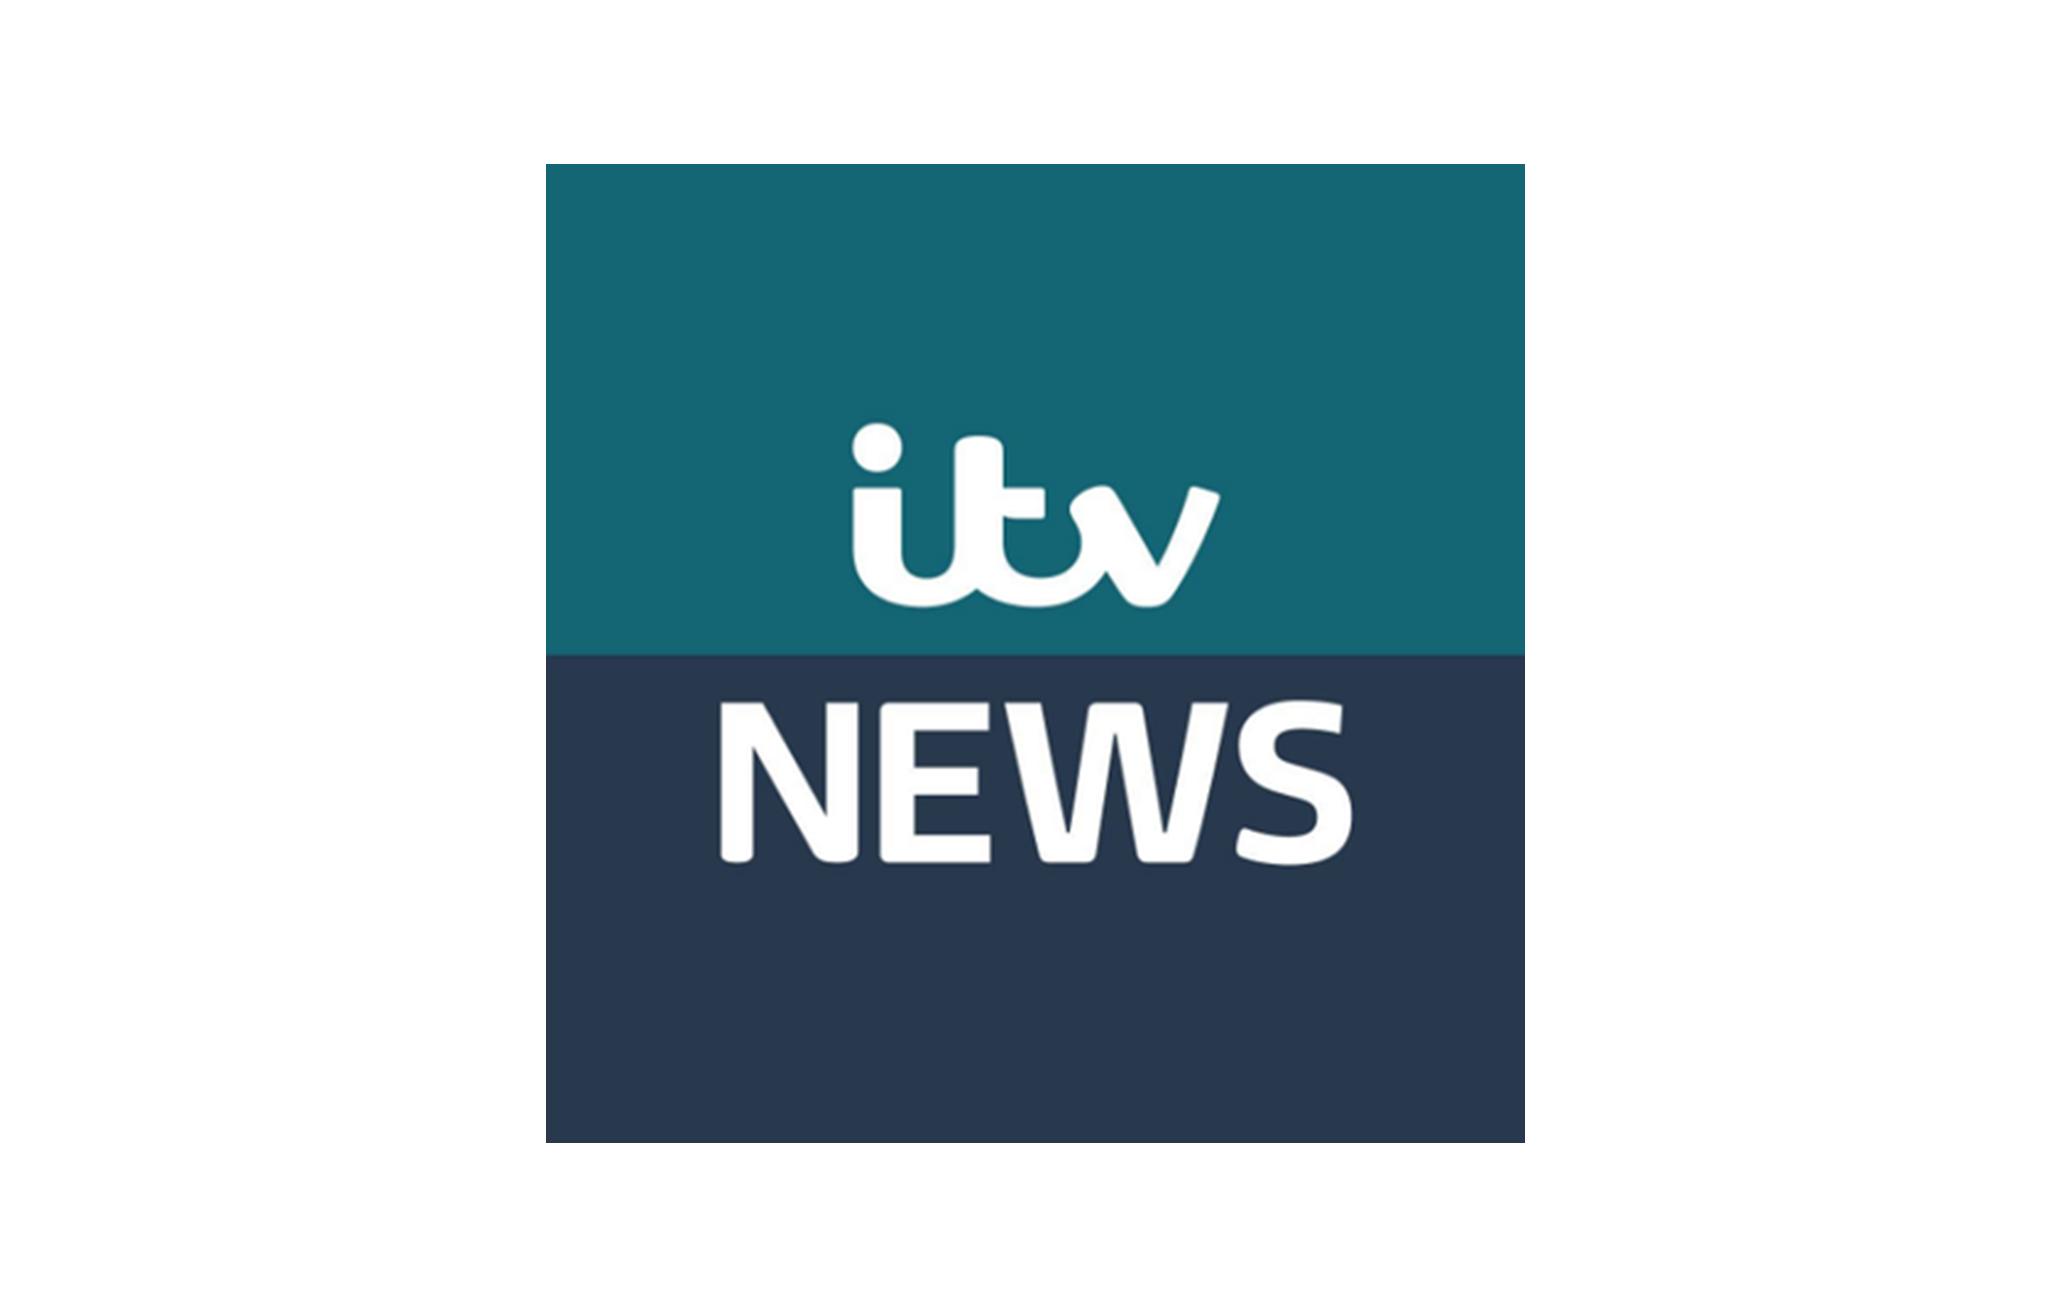 News Logos_v03 ITV News.png